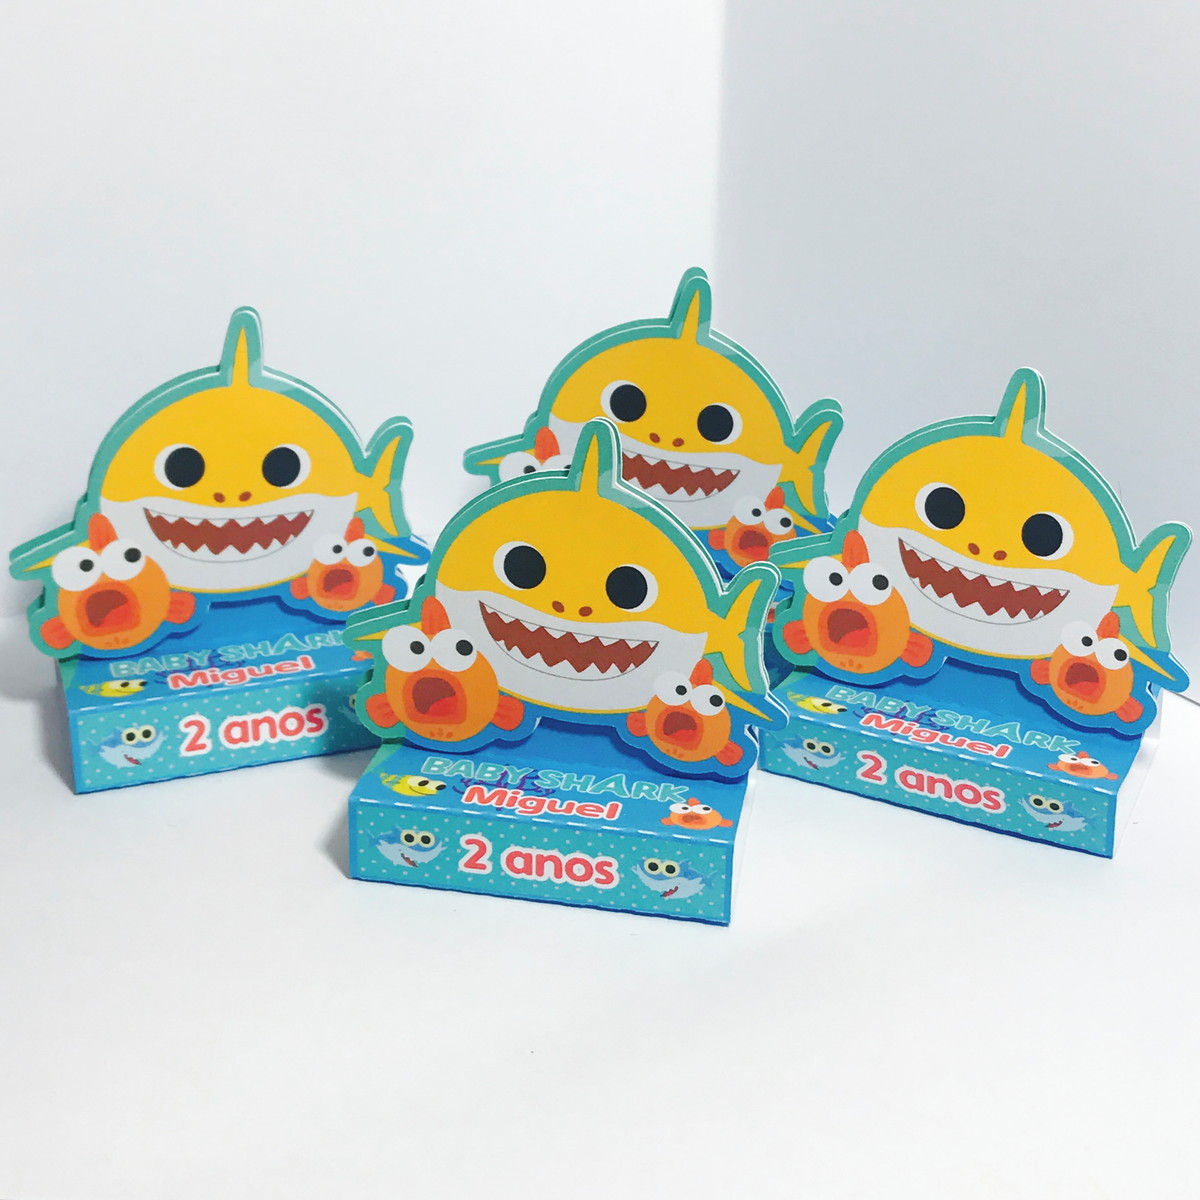 Lembrancinha Personalizada Baby Shark